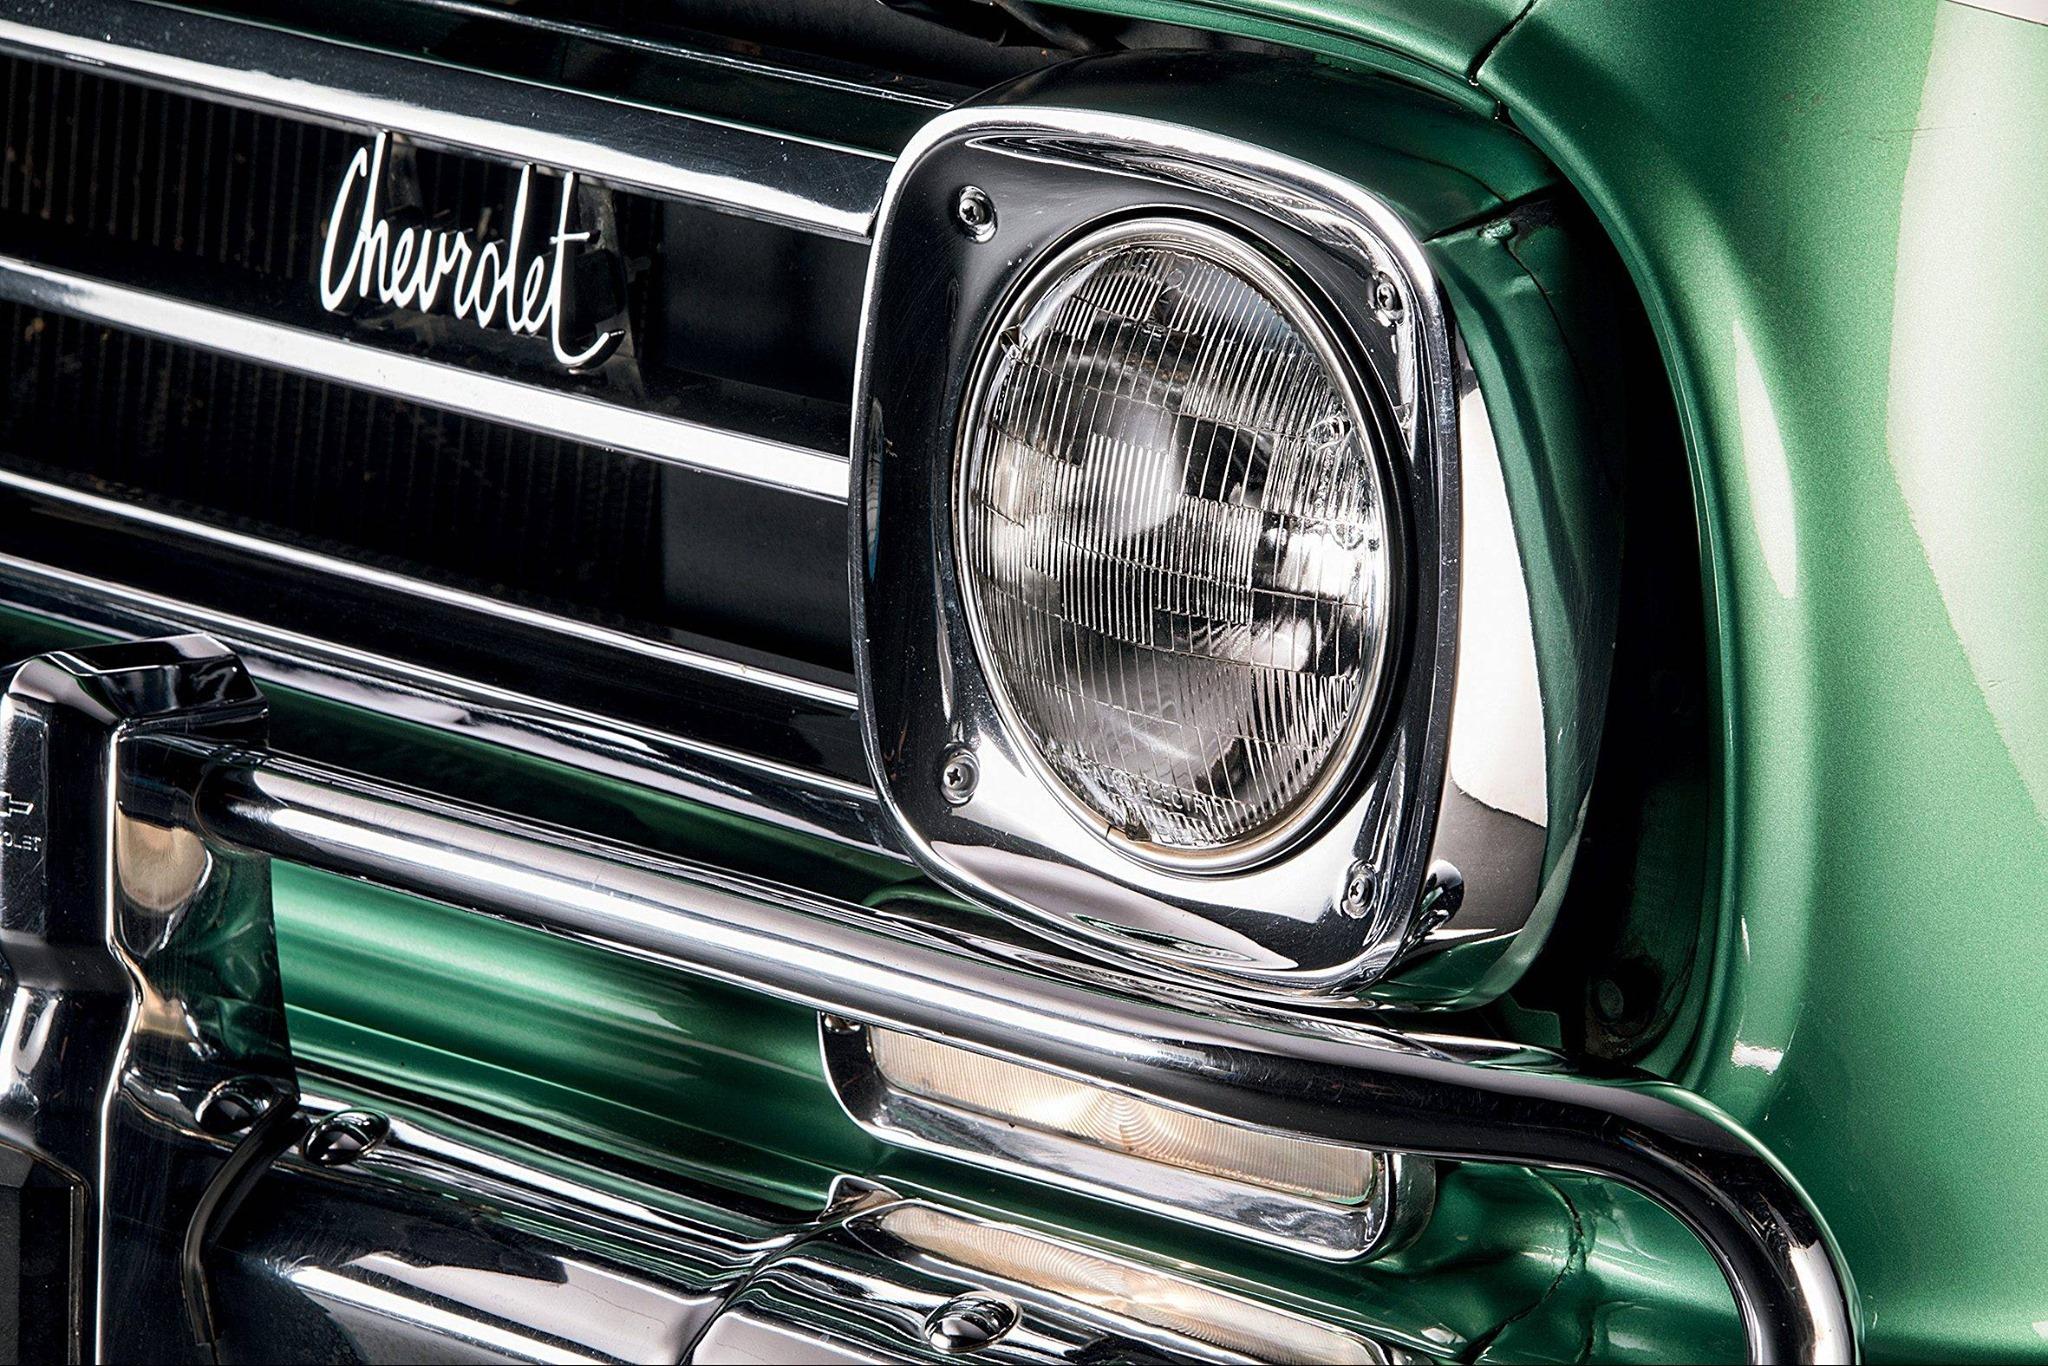 Chevrolet-Veraneio--1964--1994-C-1416-5